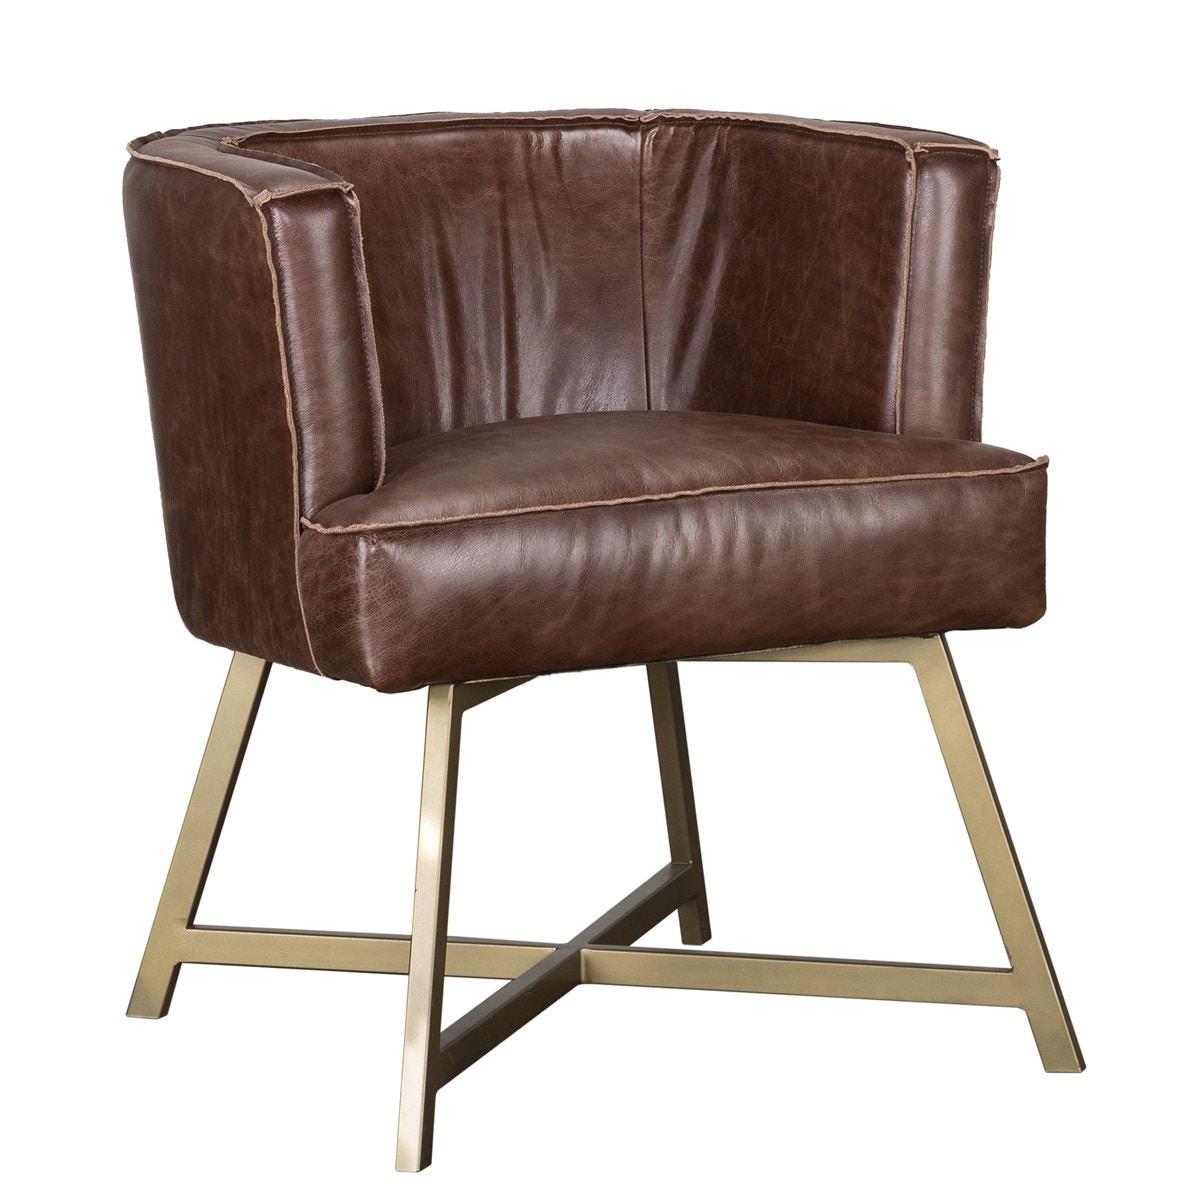 Classic Home Avenue Accent Chair Brown 53004919 In Portland, Oregon